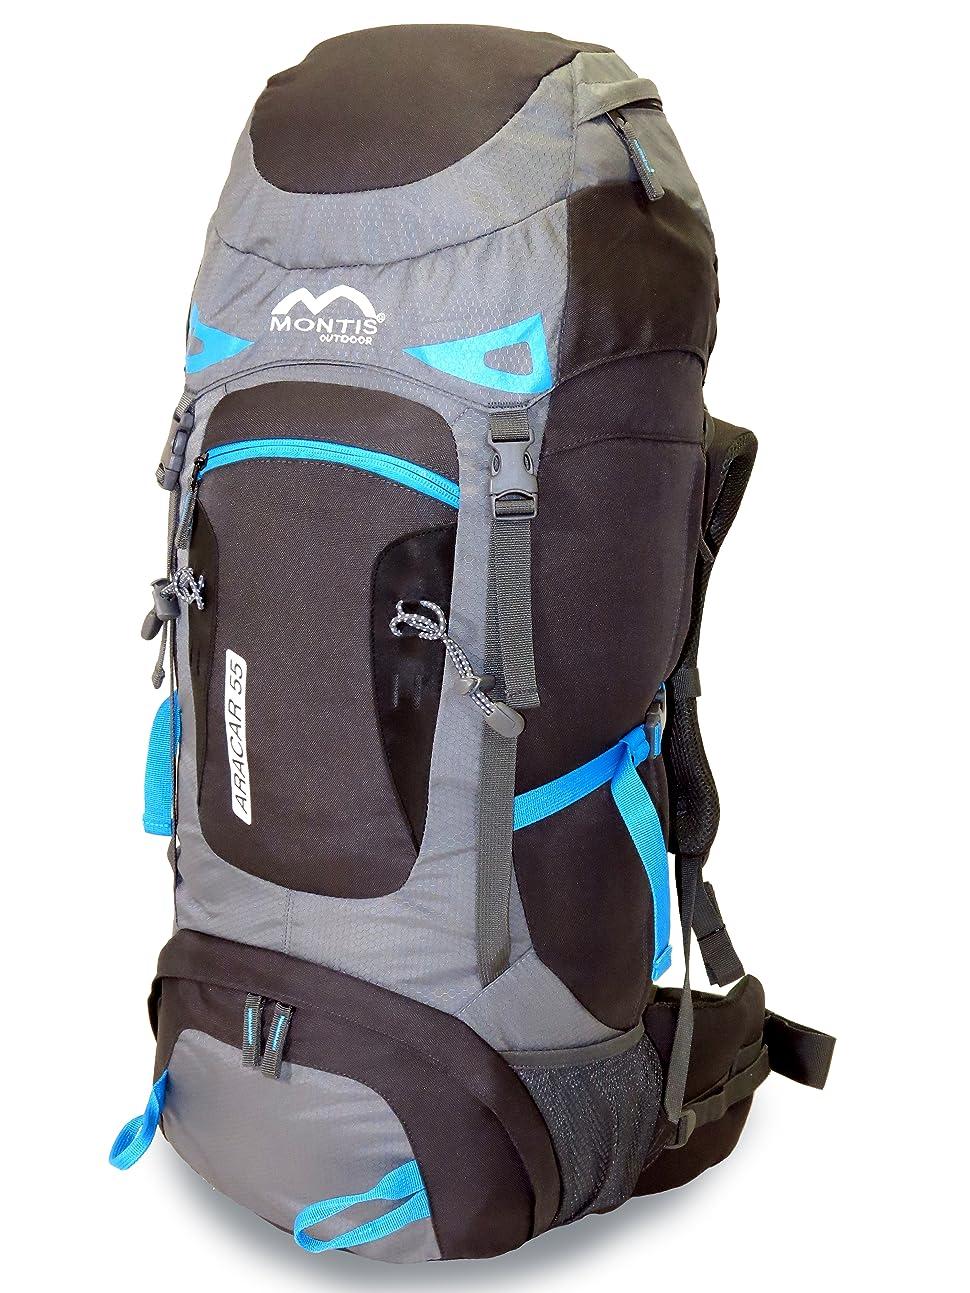 MONTIS ARACAR 55 - Mochila de trekking y senderismo - 55 l - 70 x 32 - 1500 g